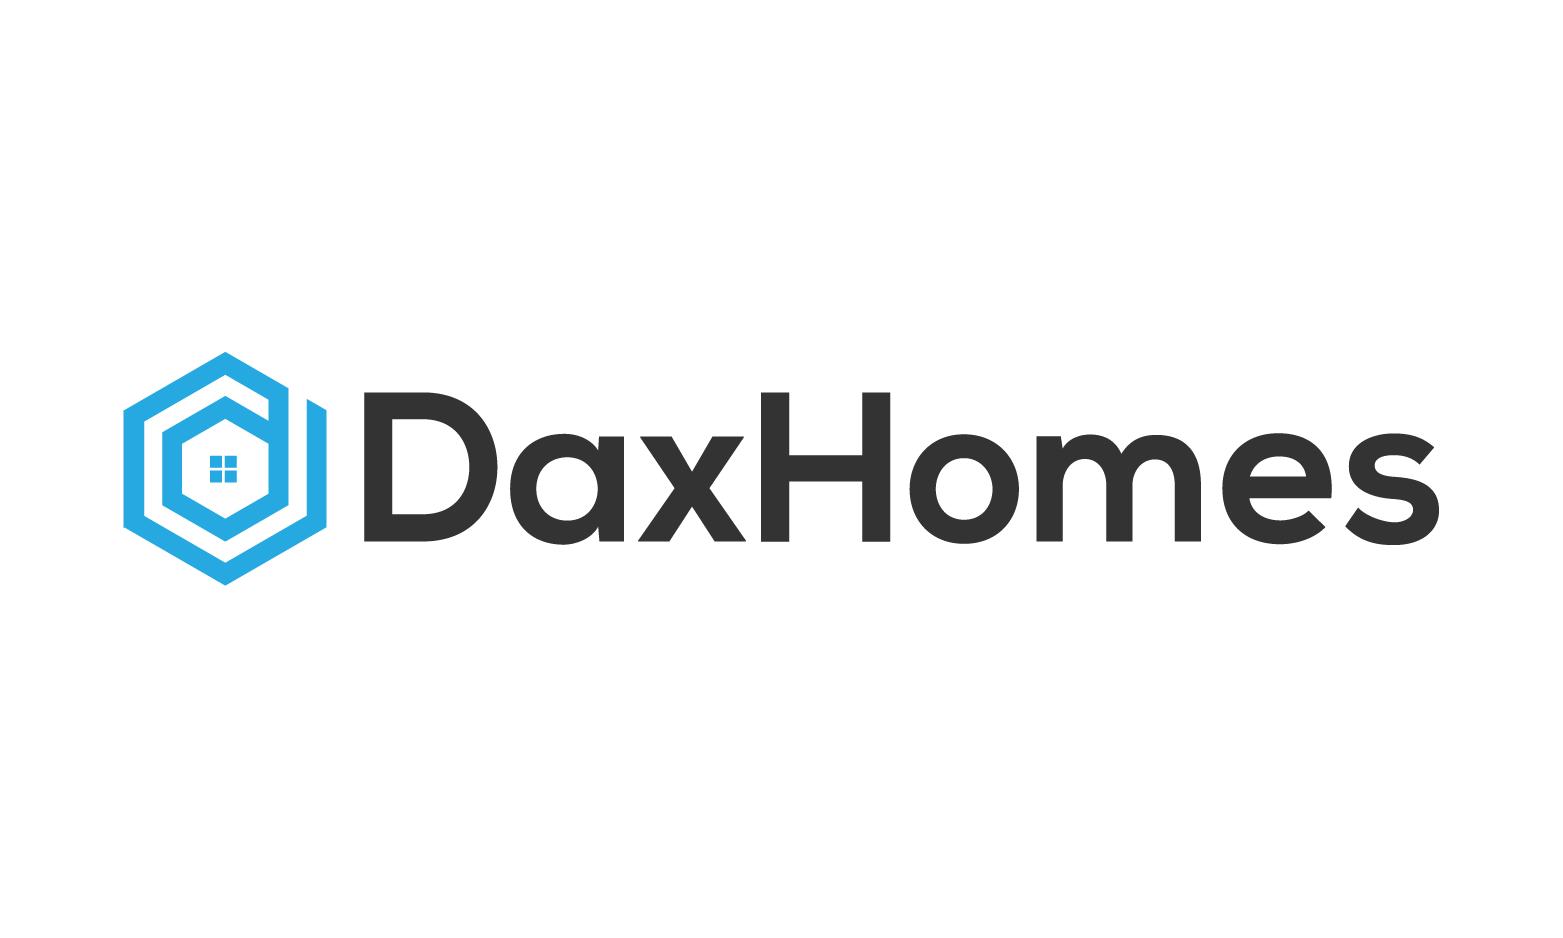 DaxHomes.com